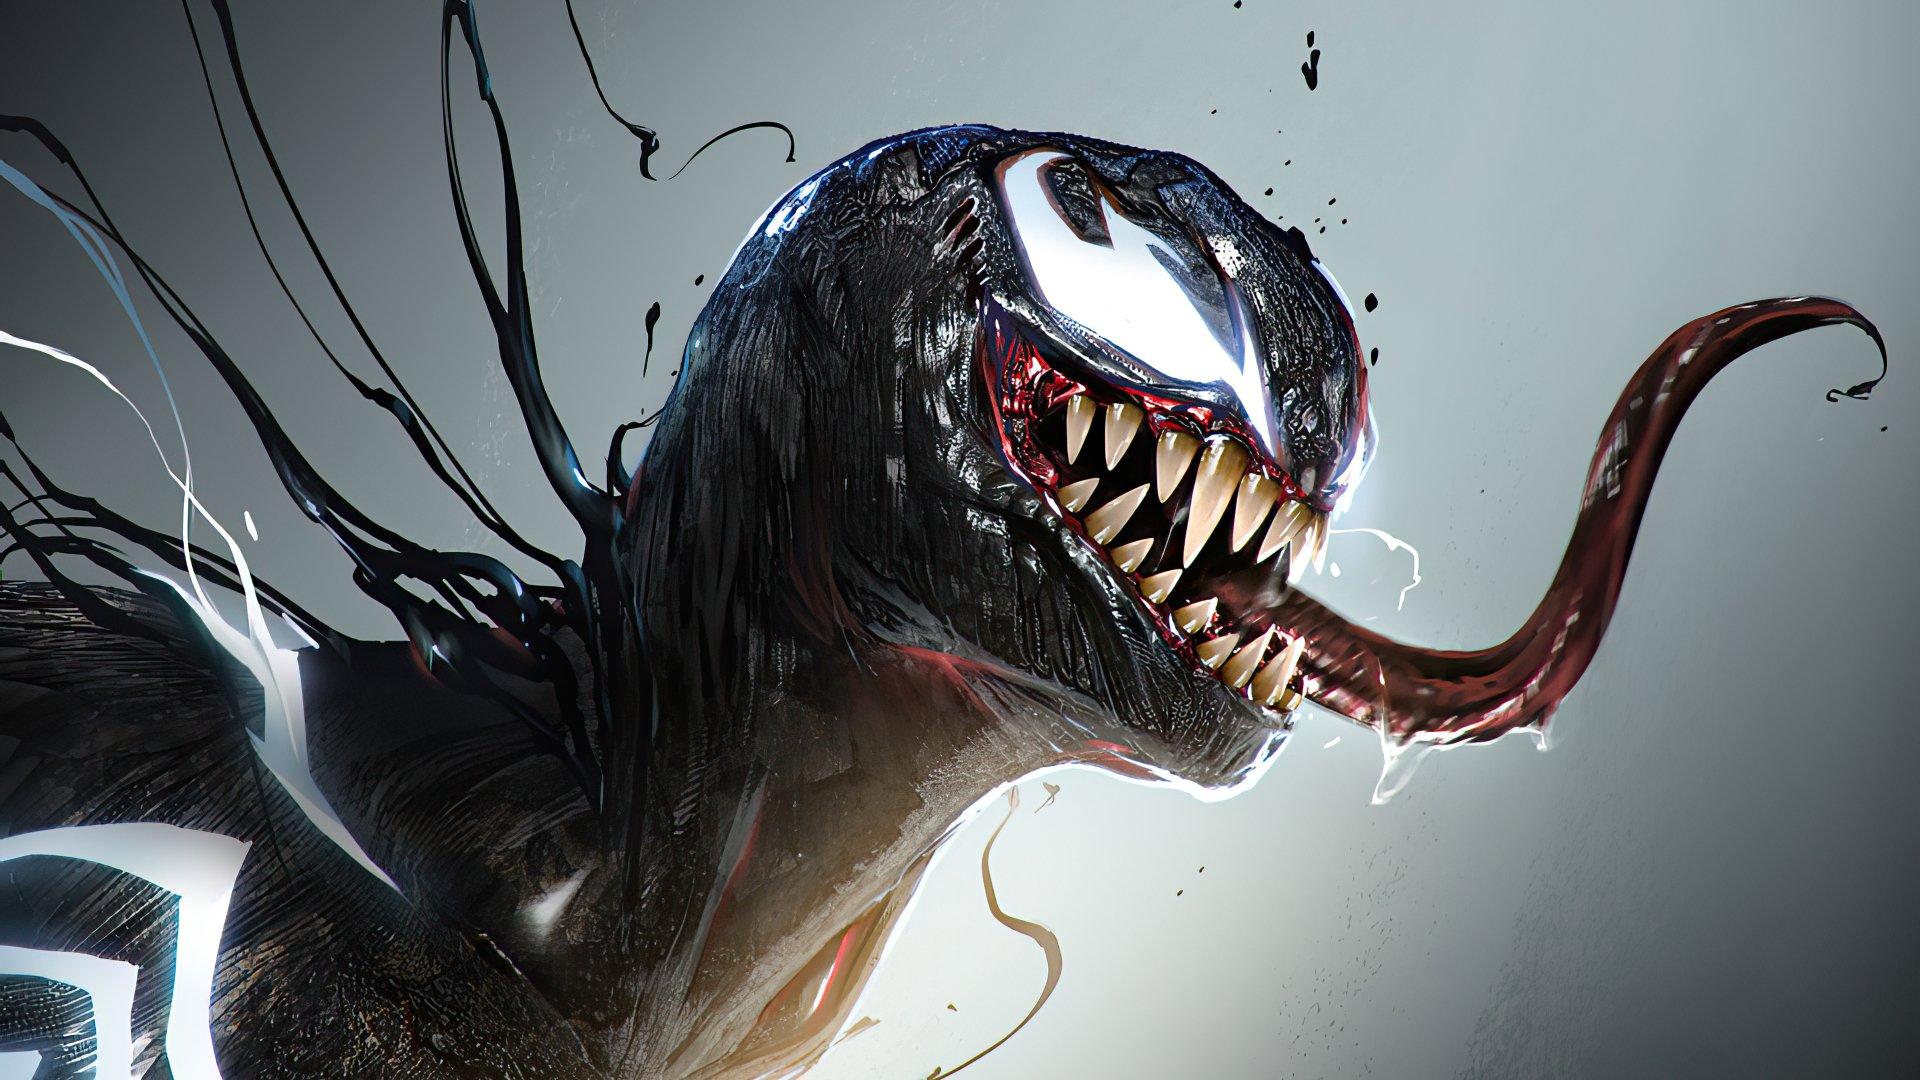 Venom 4k Ultra HD Wallpaper | Background Image | 3840x2160 ...